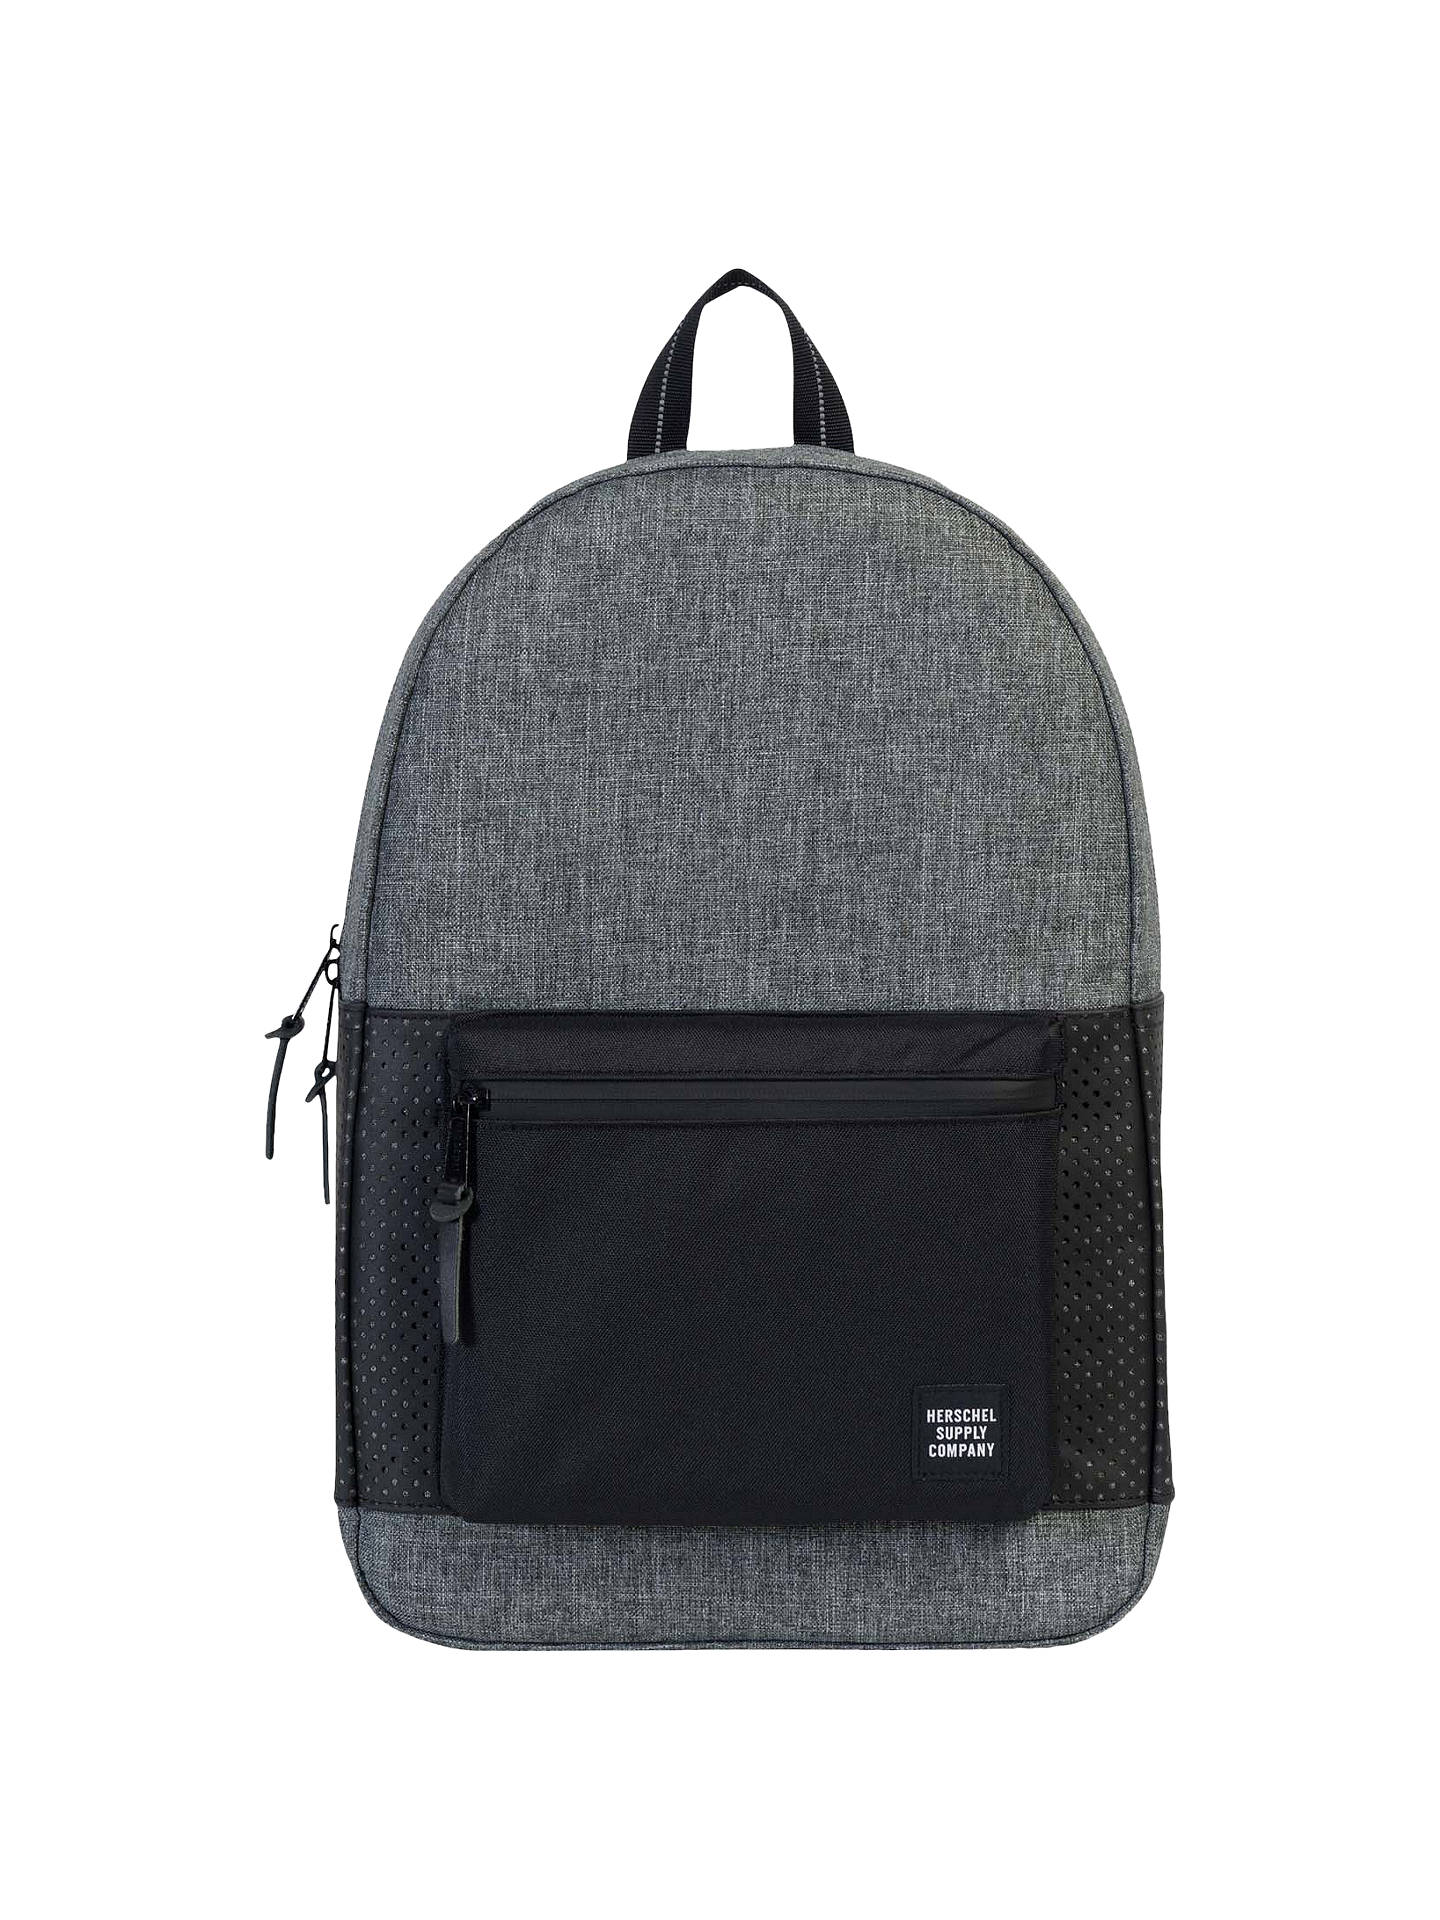 4e597dad783 Buy Herschel Supply Co. Settlement Backpack